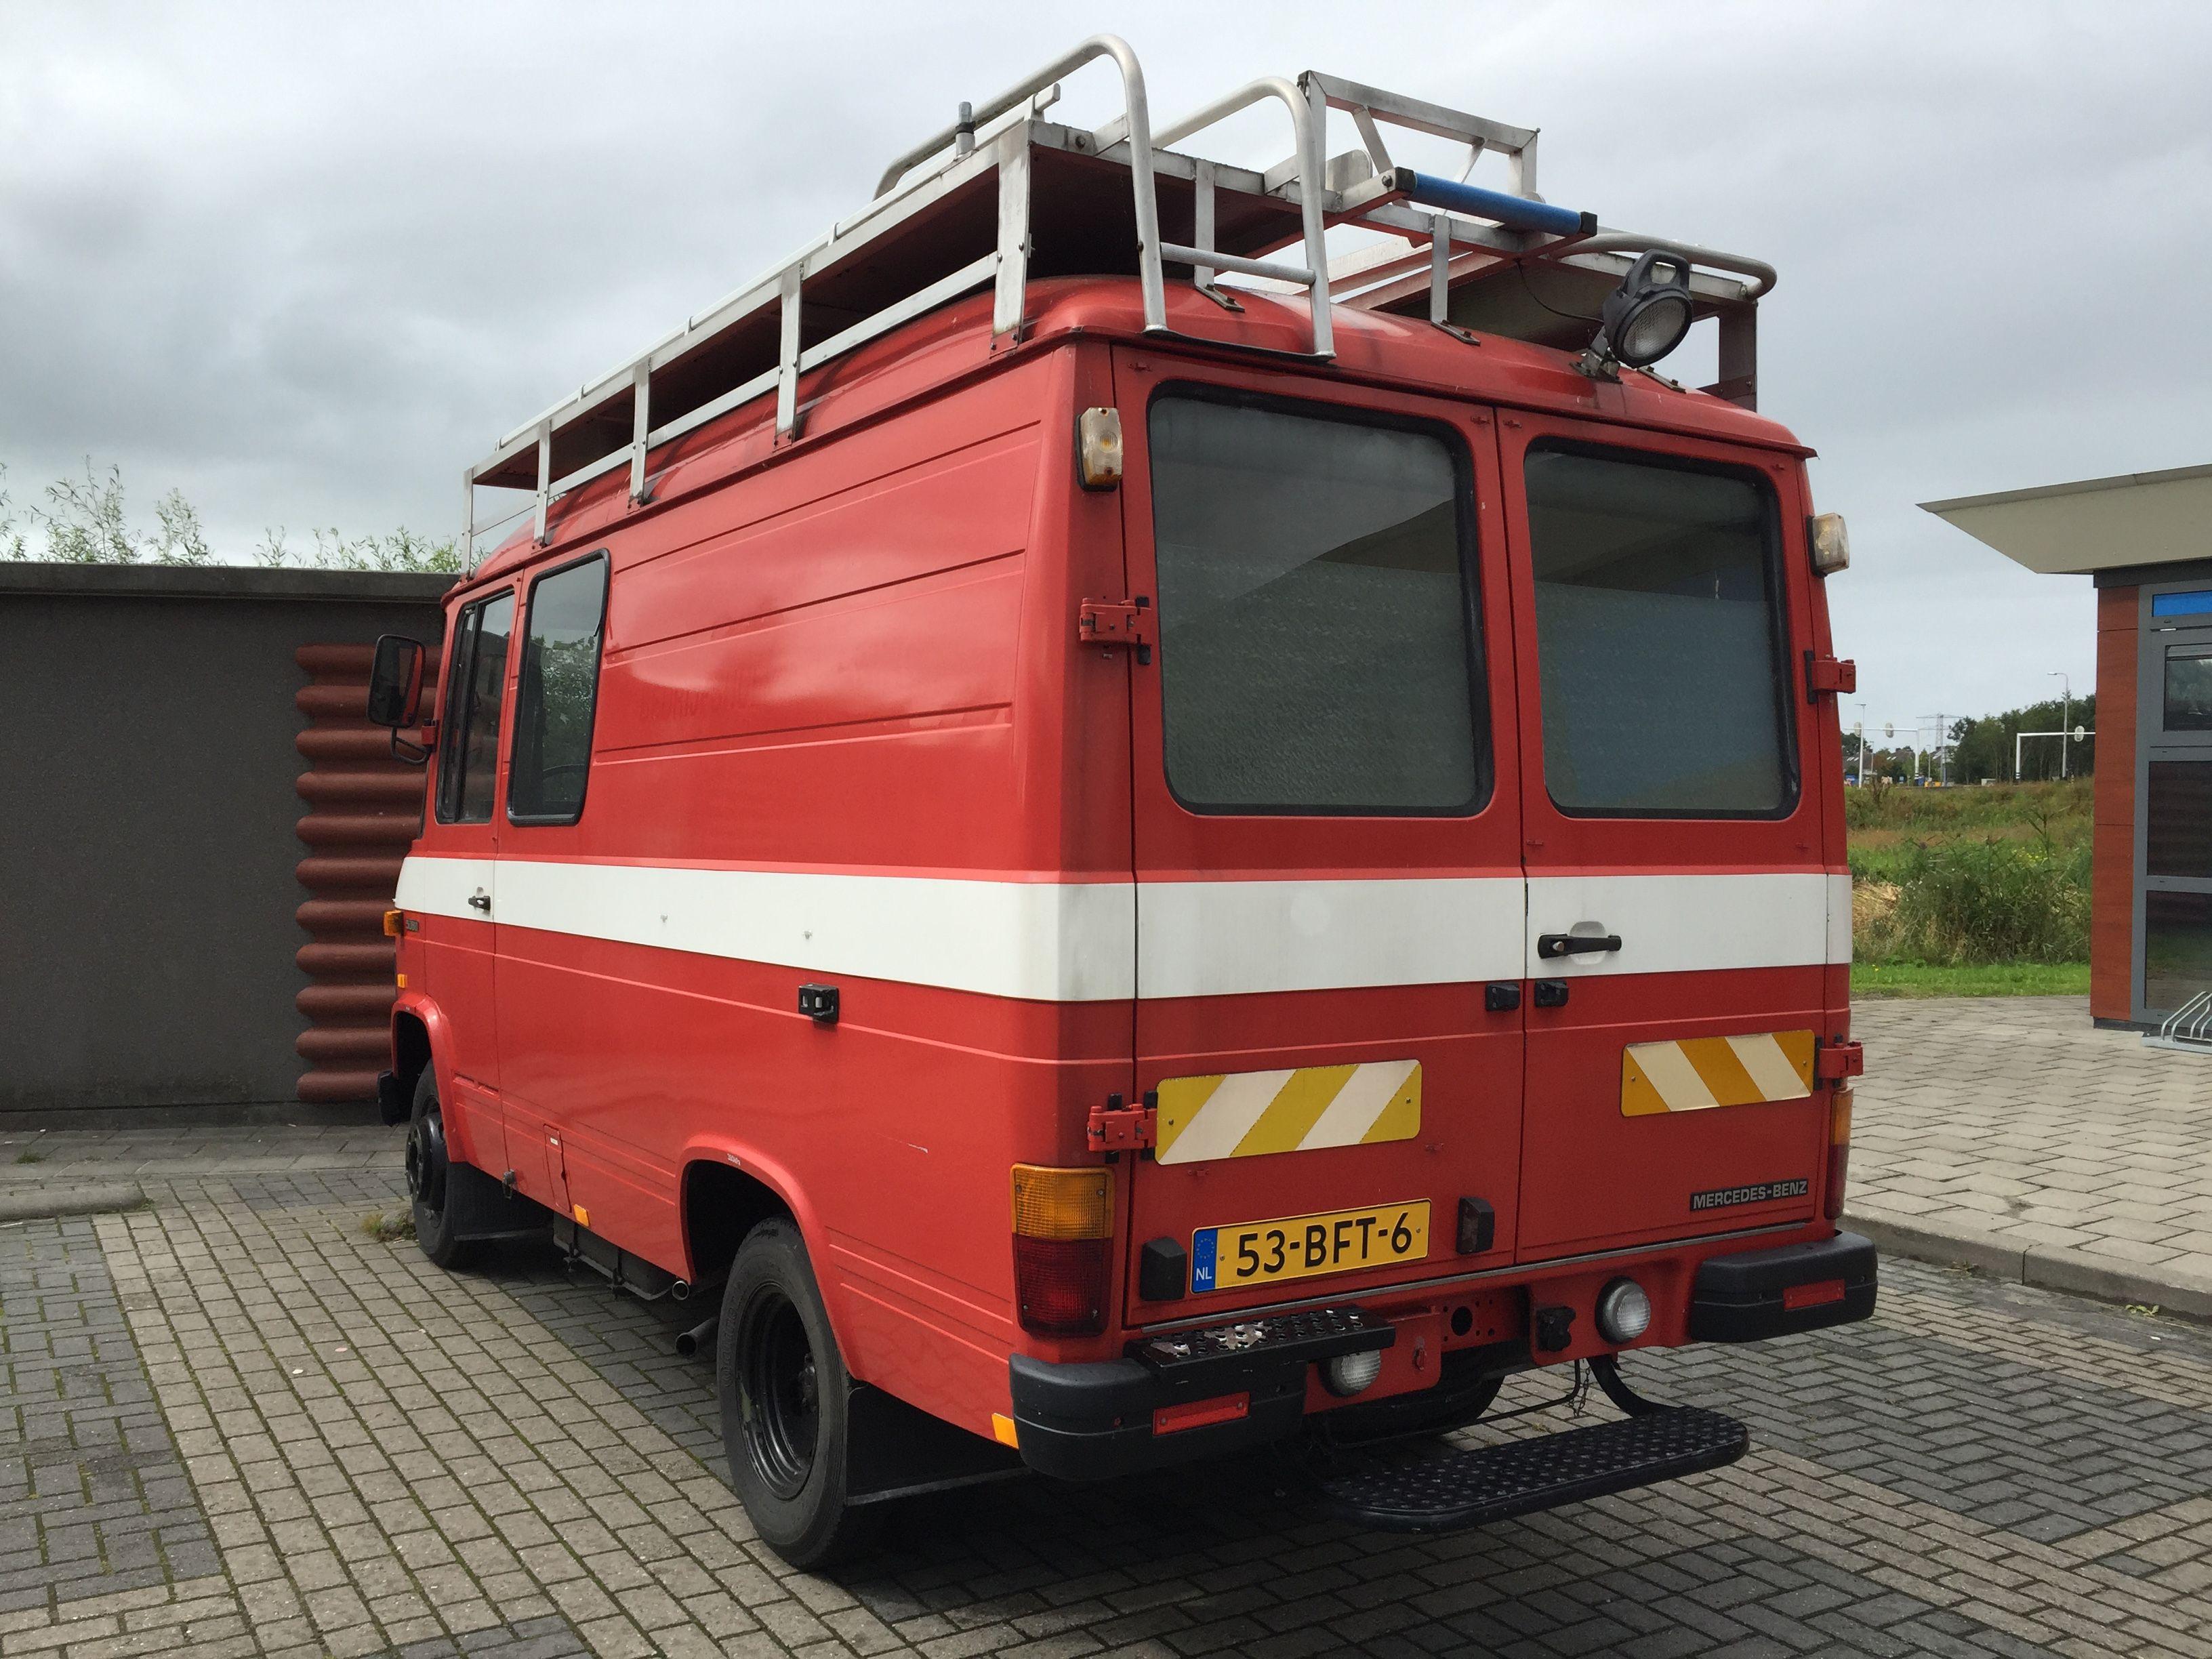 Mercedes 508 ambulance firetruck soon to be a custom campervan custom camper by